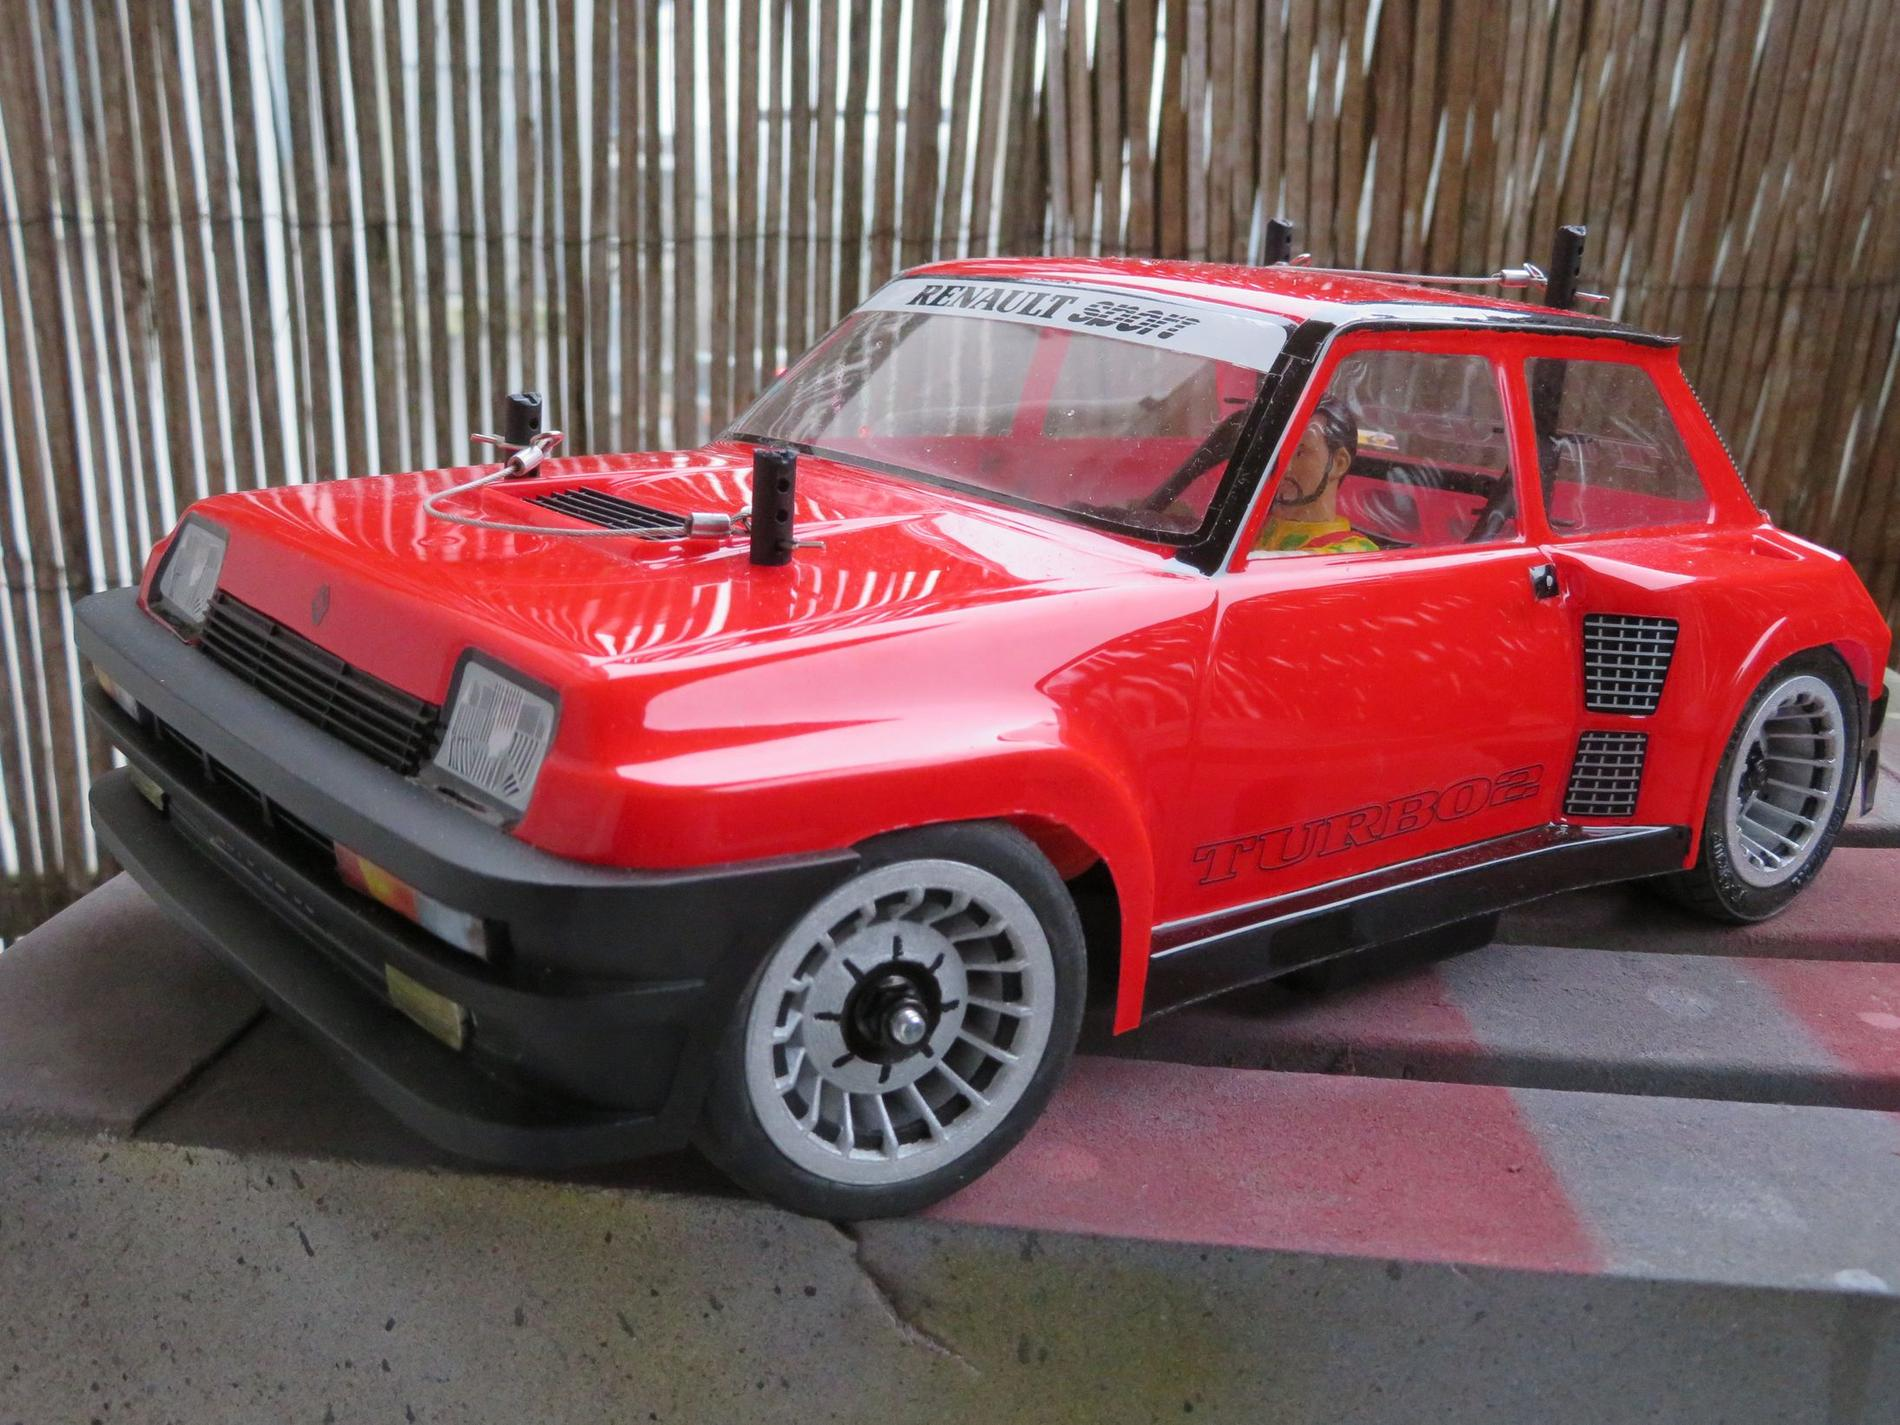 Tamiya Renault 5 Turbo - M08 Concept 9a5baba112d1e05c60e3b66870e1aae6